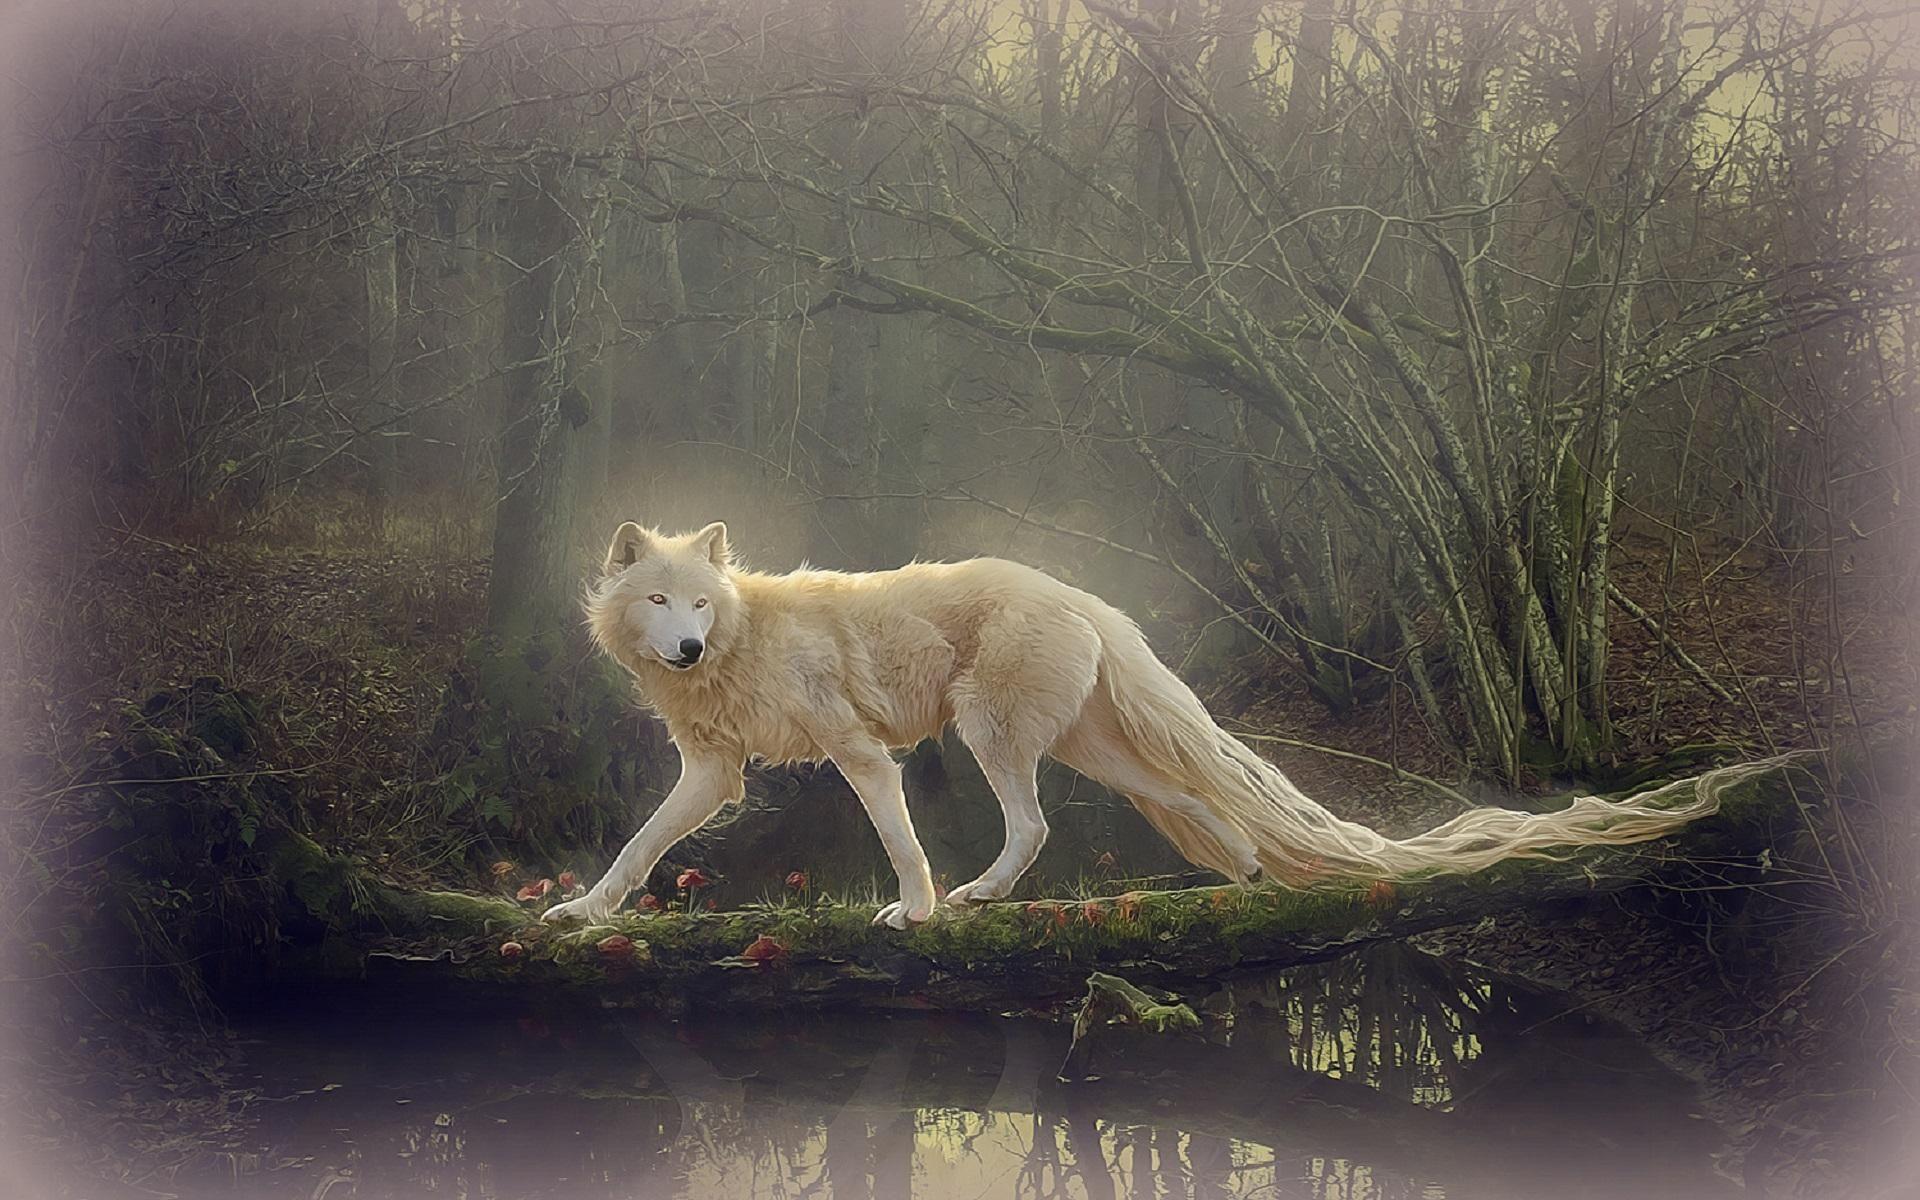 Beautiful White Wolf Wallpaper Hd Best Wallpaper Hd Beautiful Wolves Wolf Wallpaper White Wolf